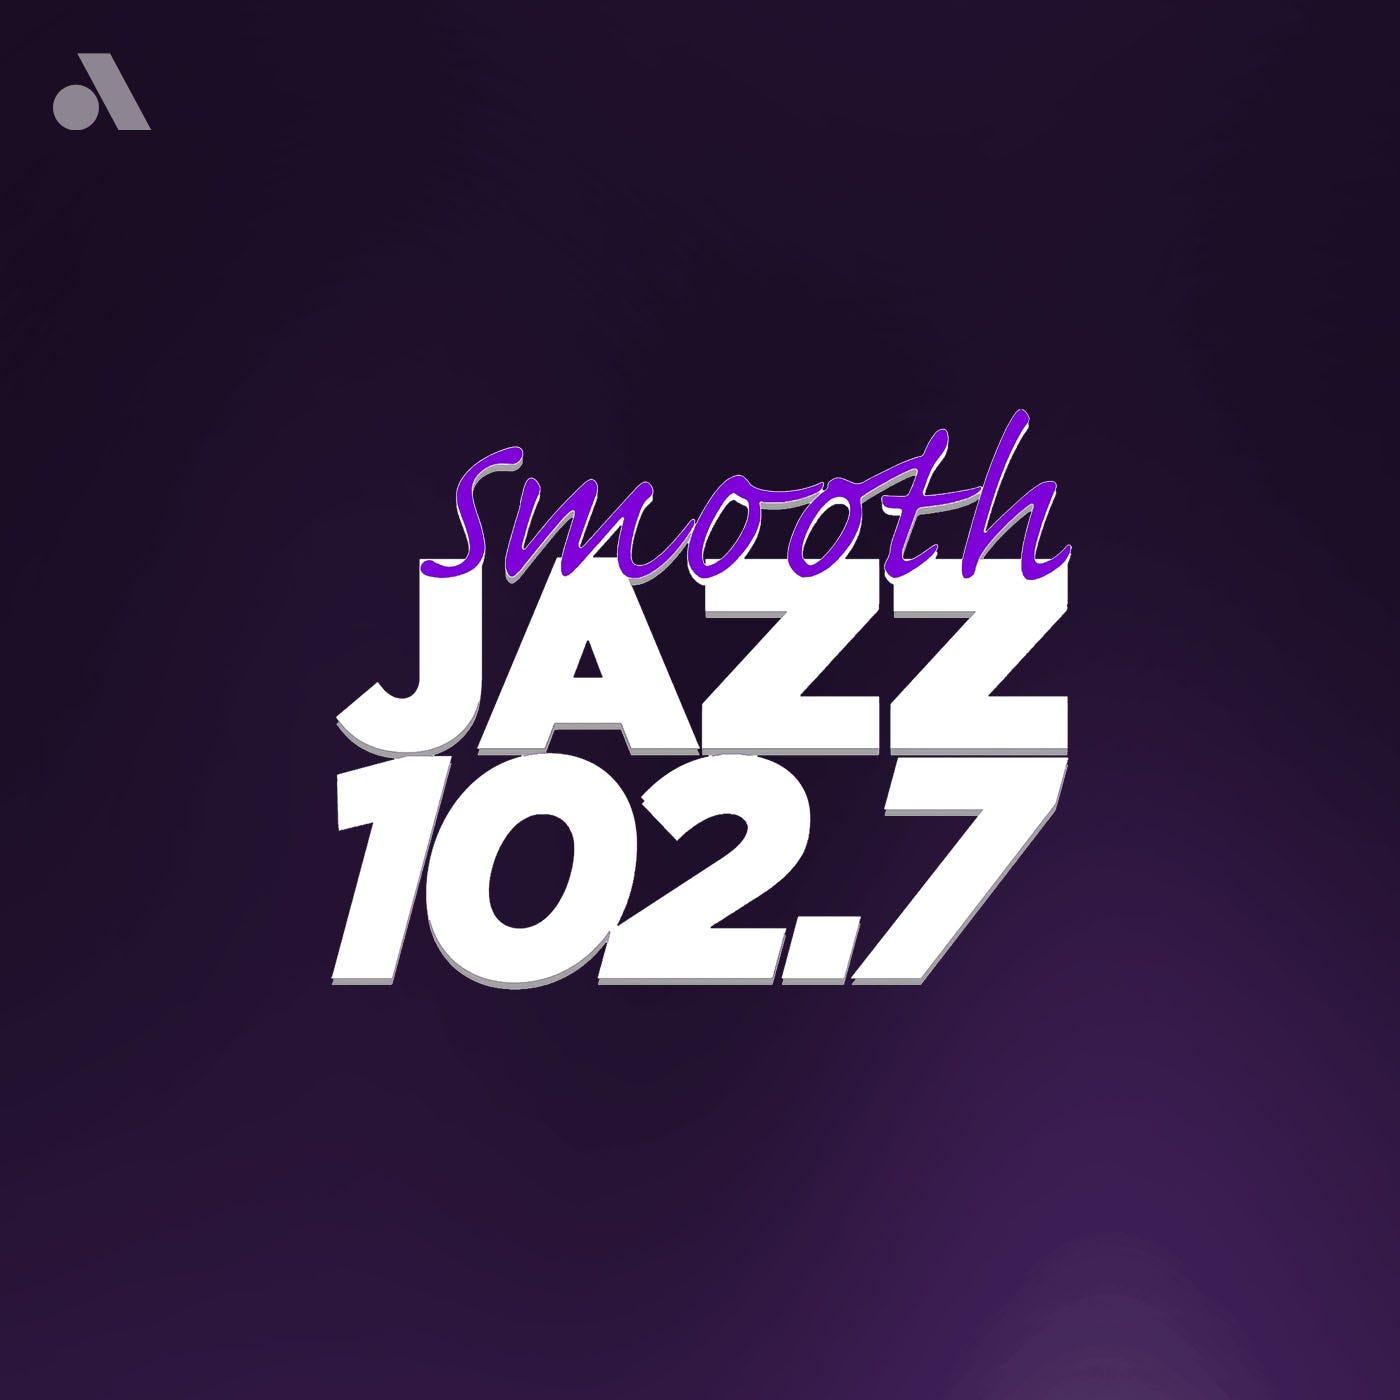 Smooth Jazz 102.7